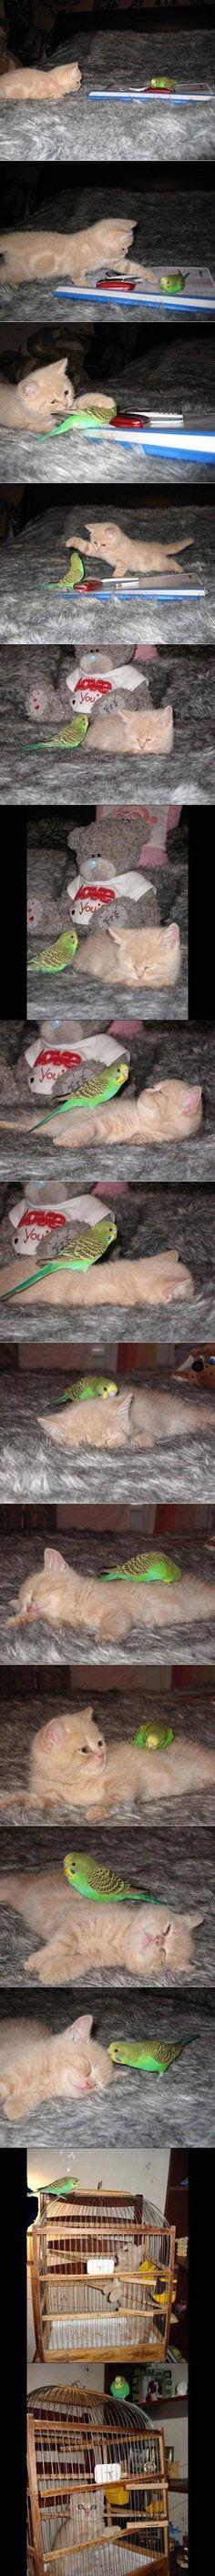 The Kitten And The Bird (15 Pics): Cats, Animals, Kitten, Friends, Stuff, Pet, Funny